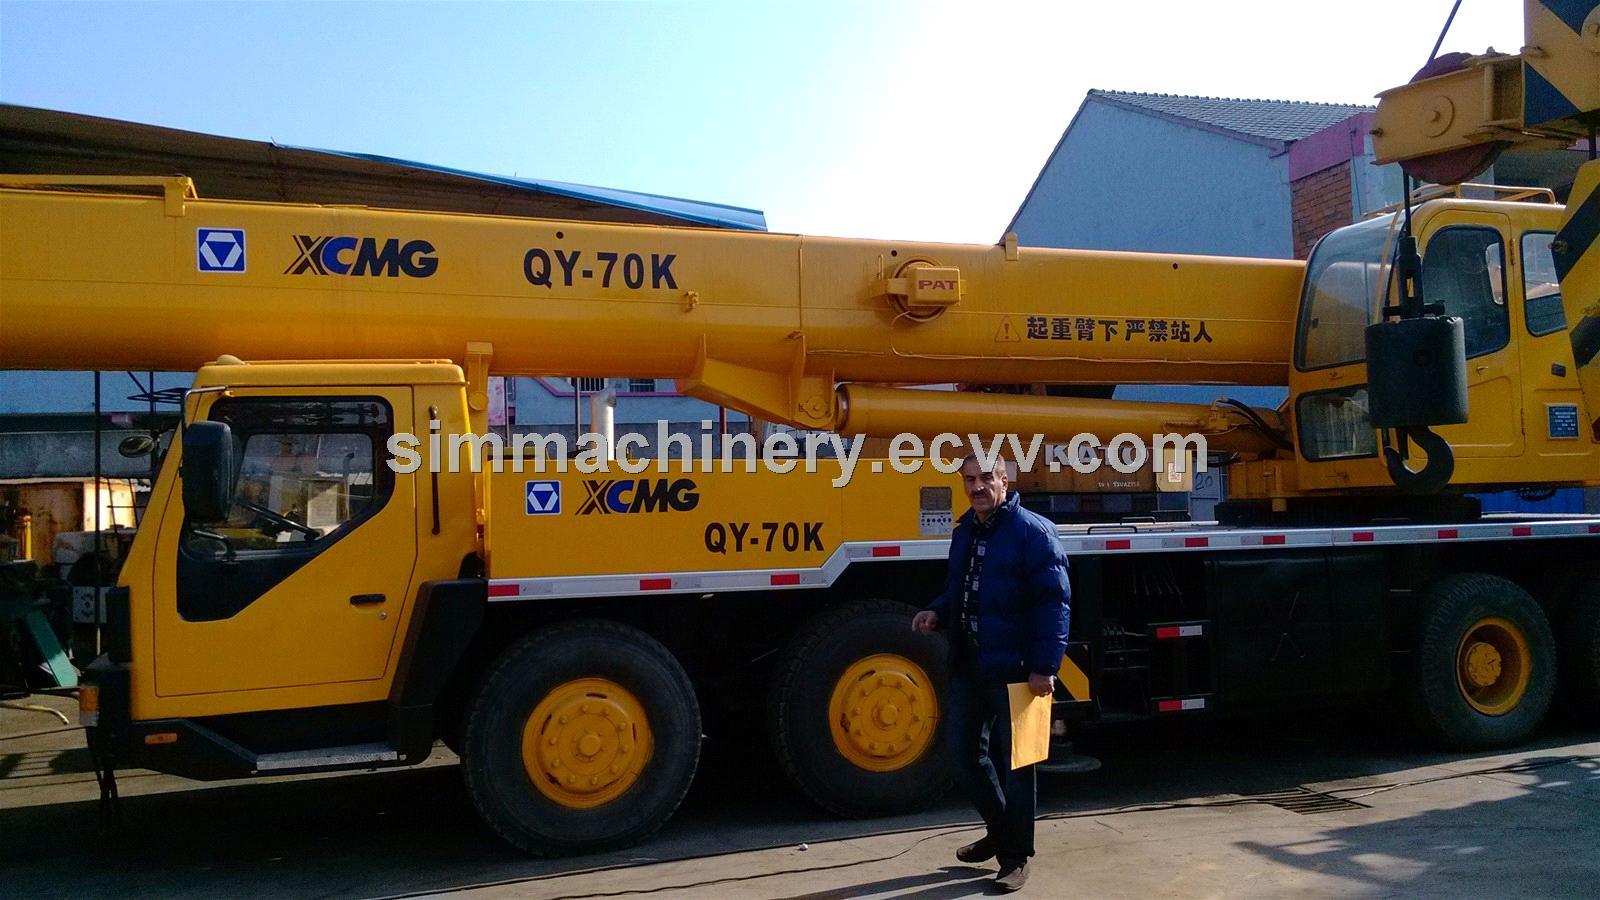 China 70 Ton Crane with Truck Zoomlion Ztc700V - China